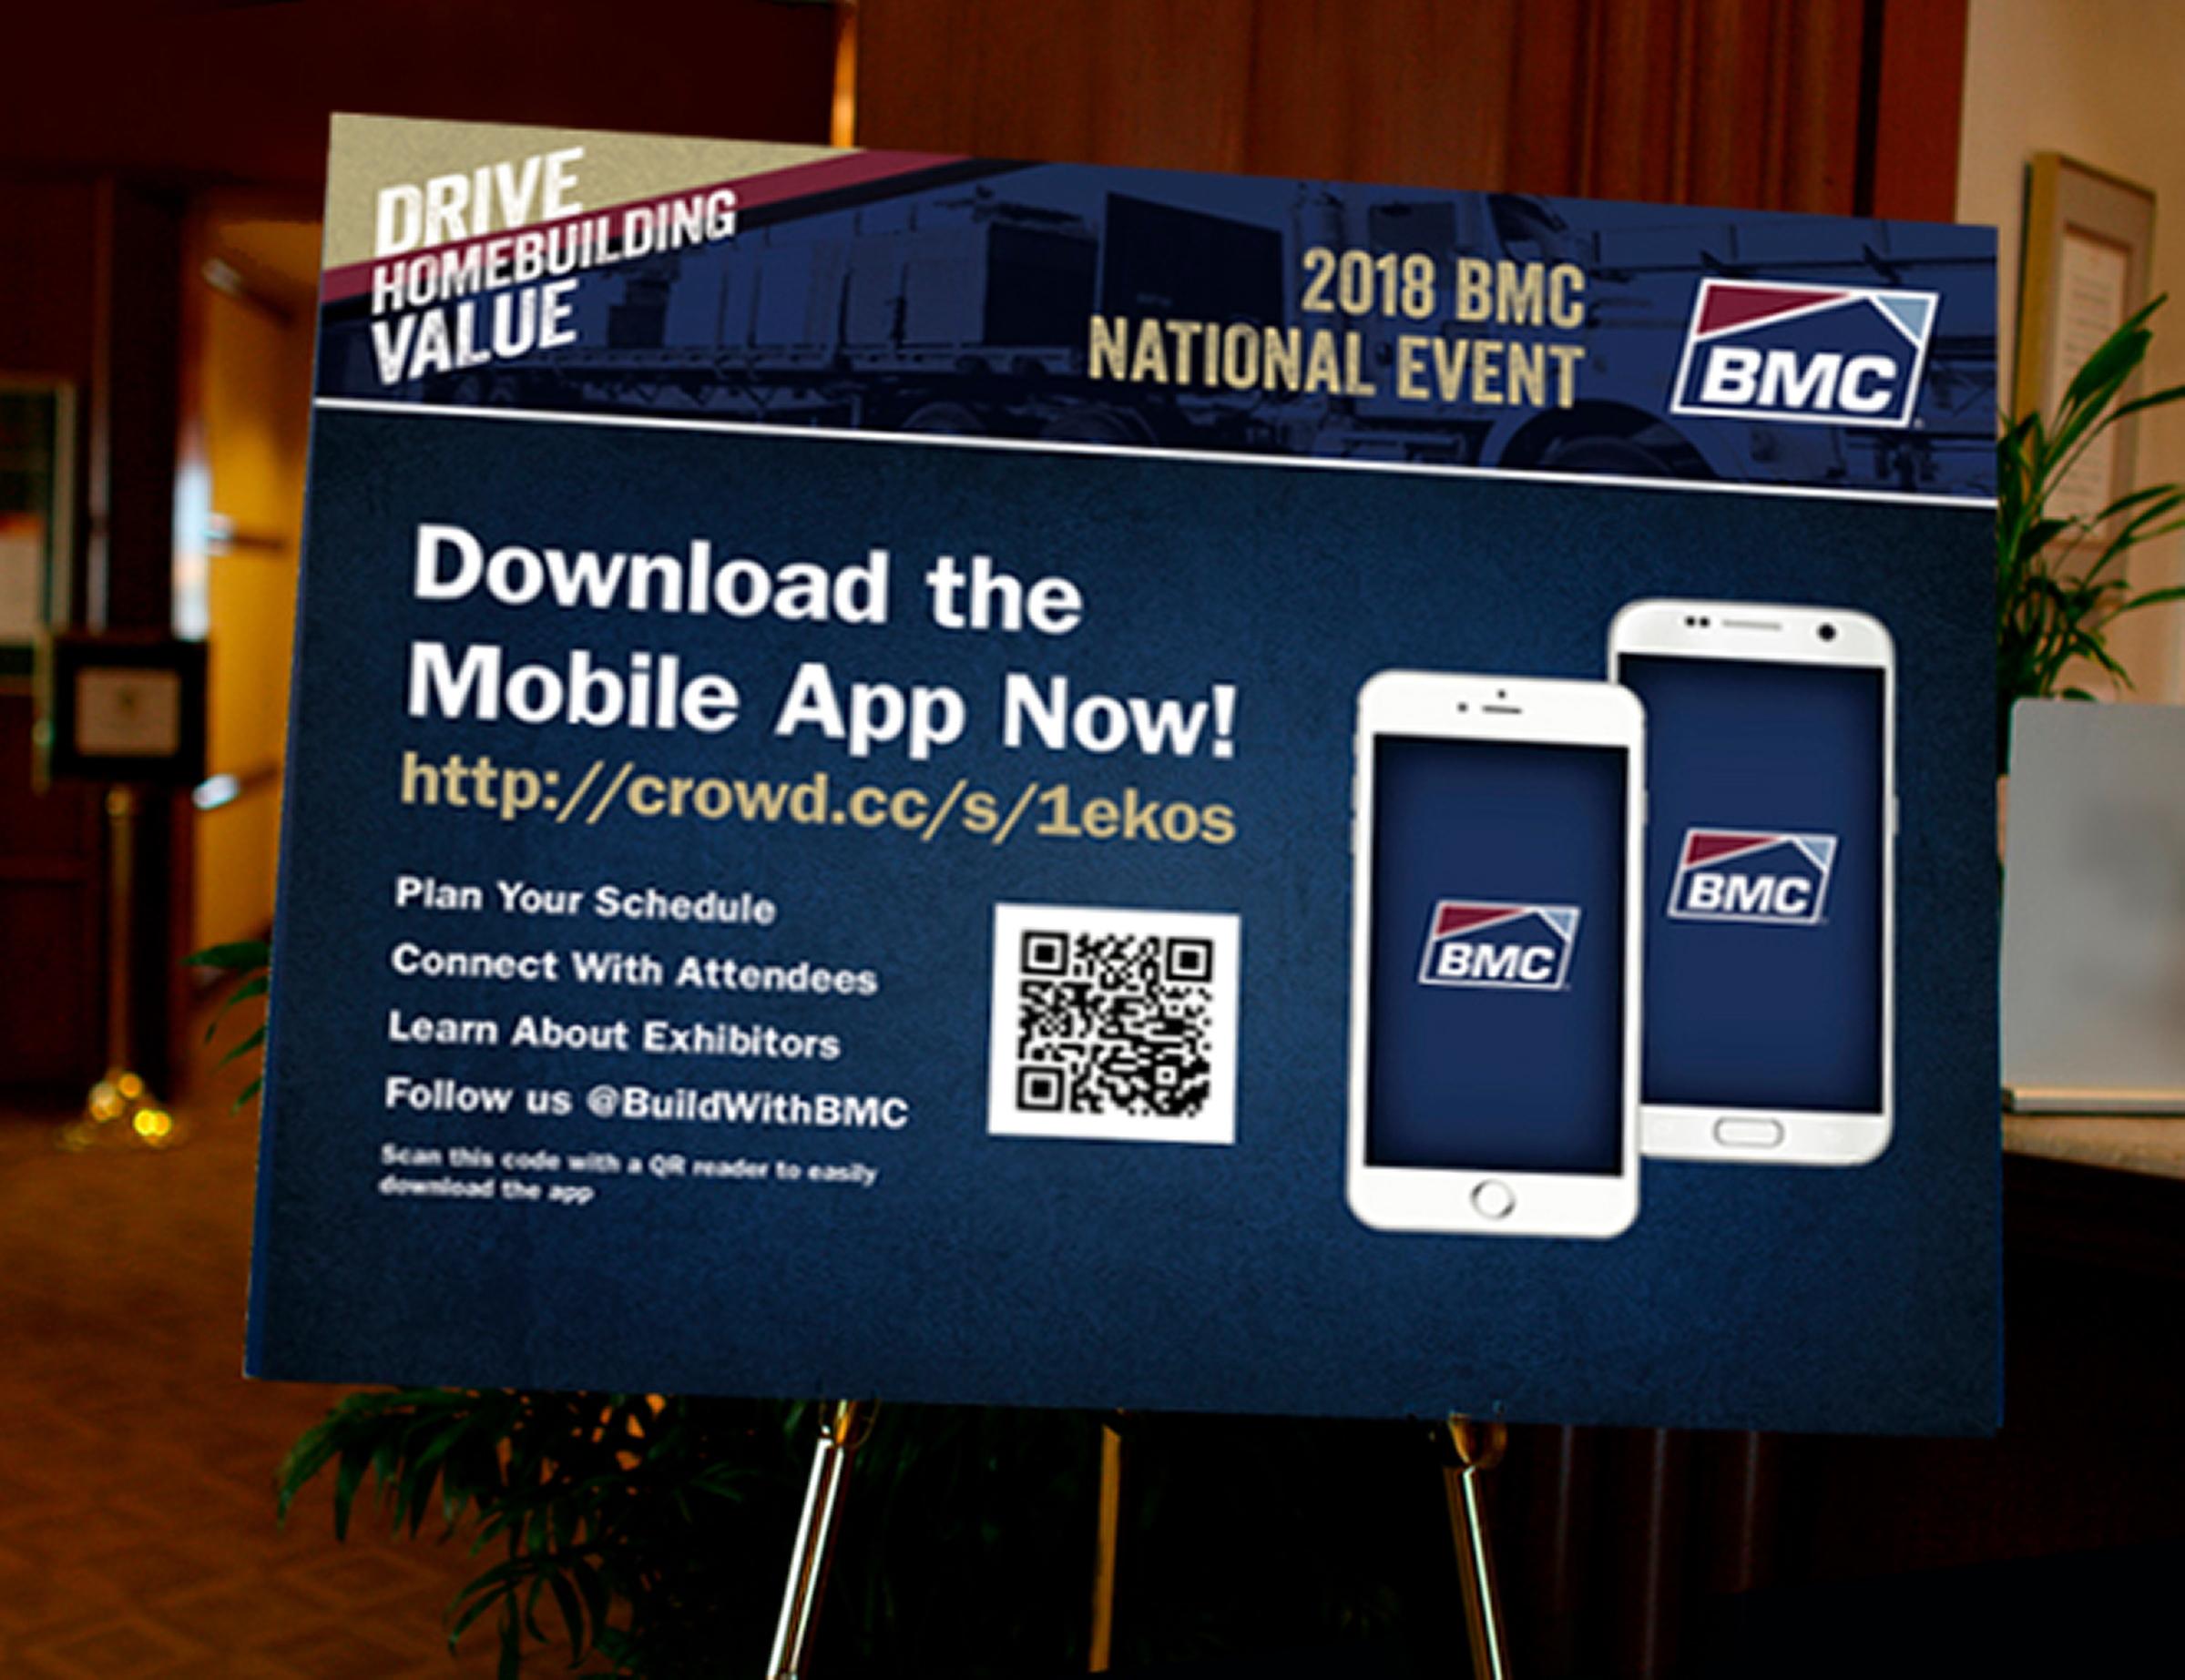 BMC_conference_sign.jpg